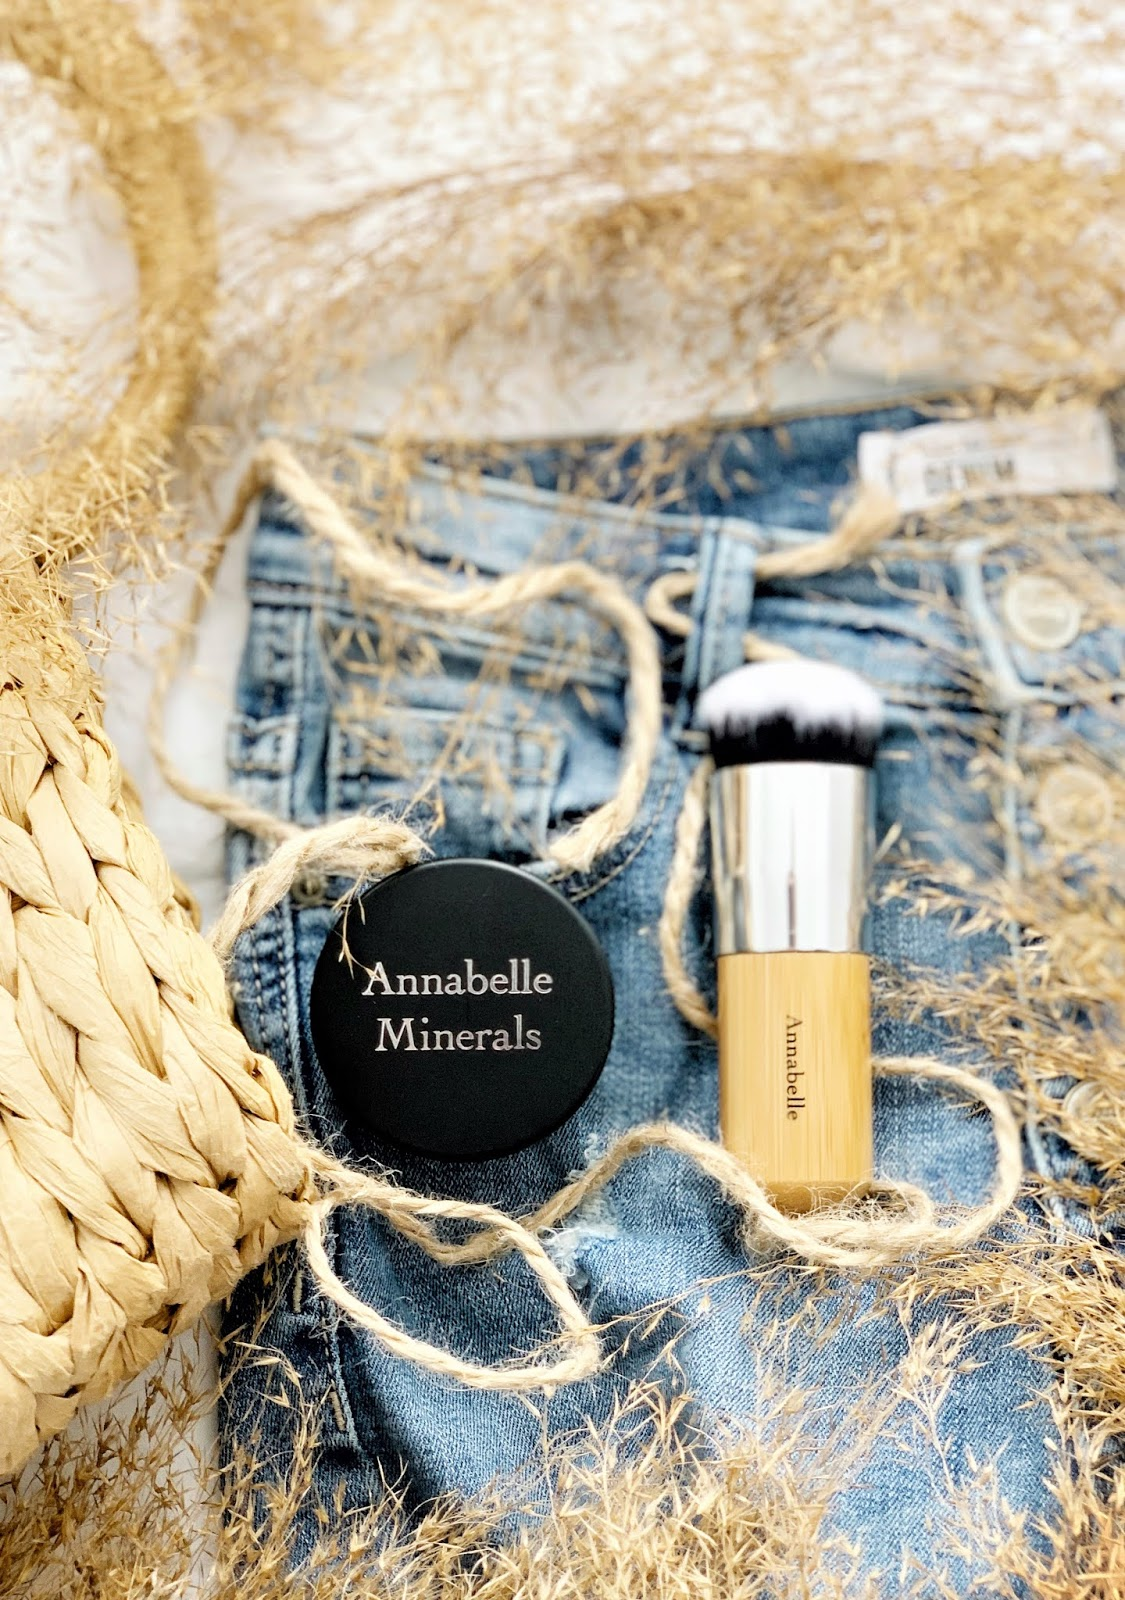 Podkład kryjący Annabelle Minerals - recenzja